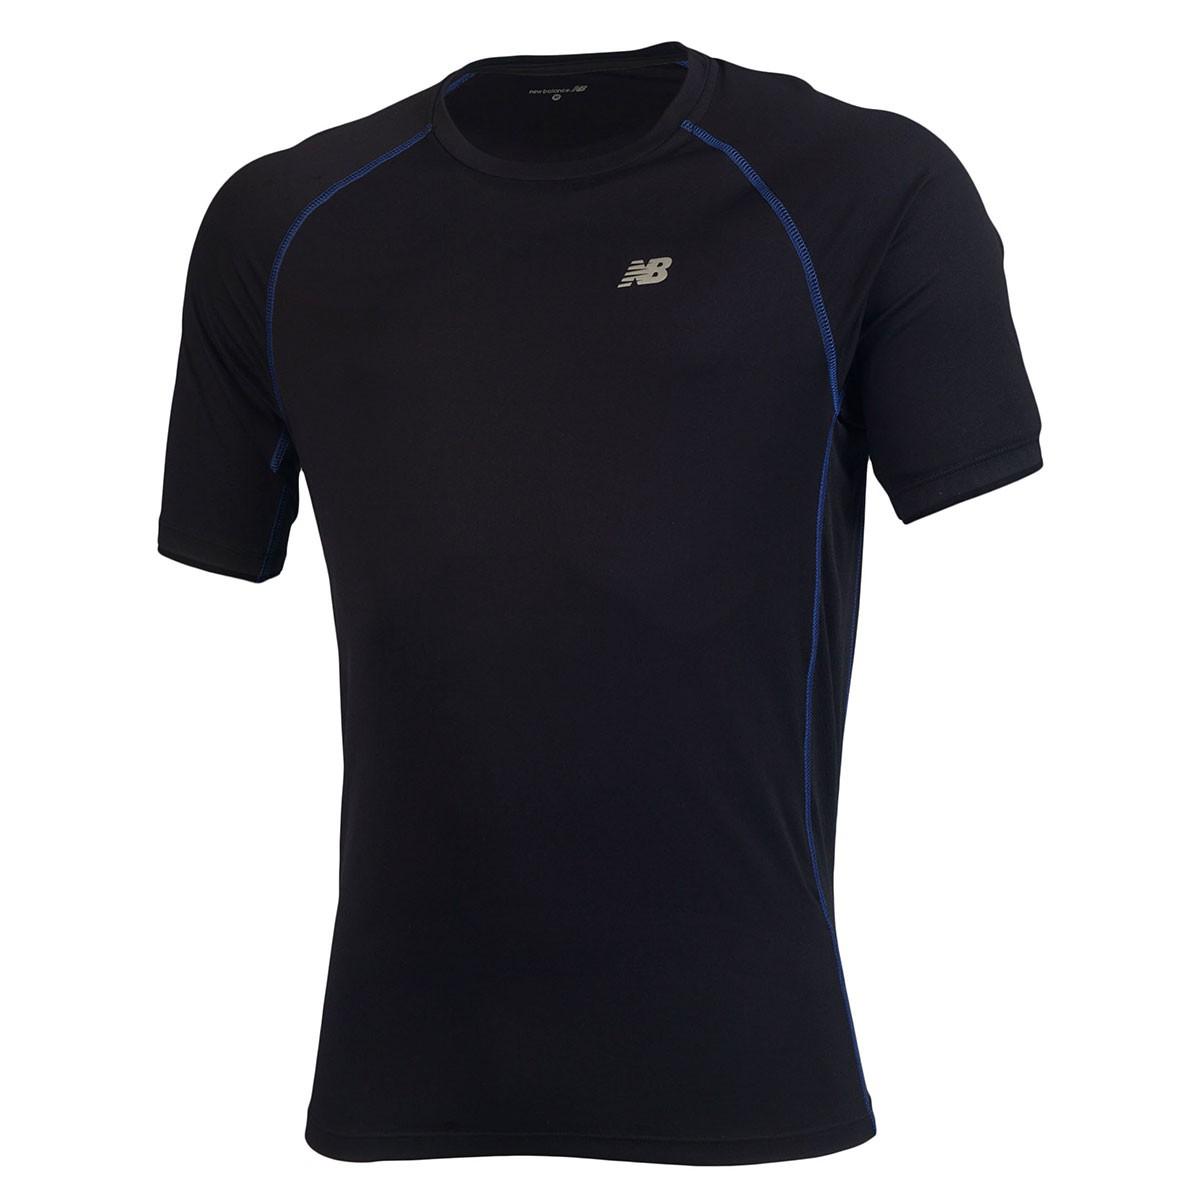 Camiseta New Balance M/C Raglan Masculino - Preto